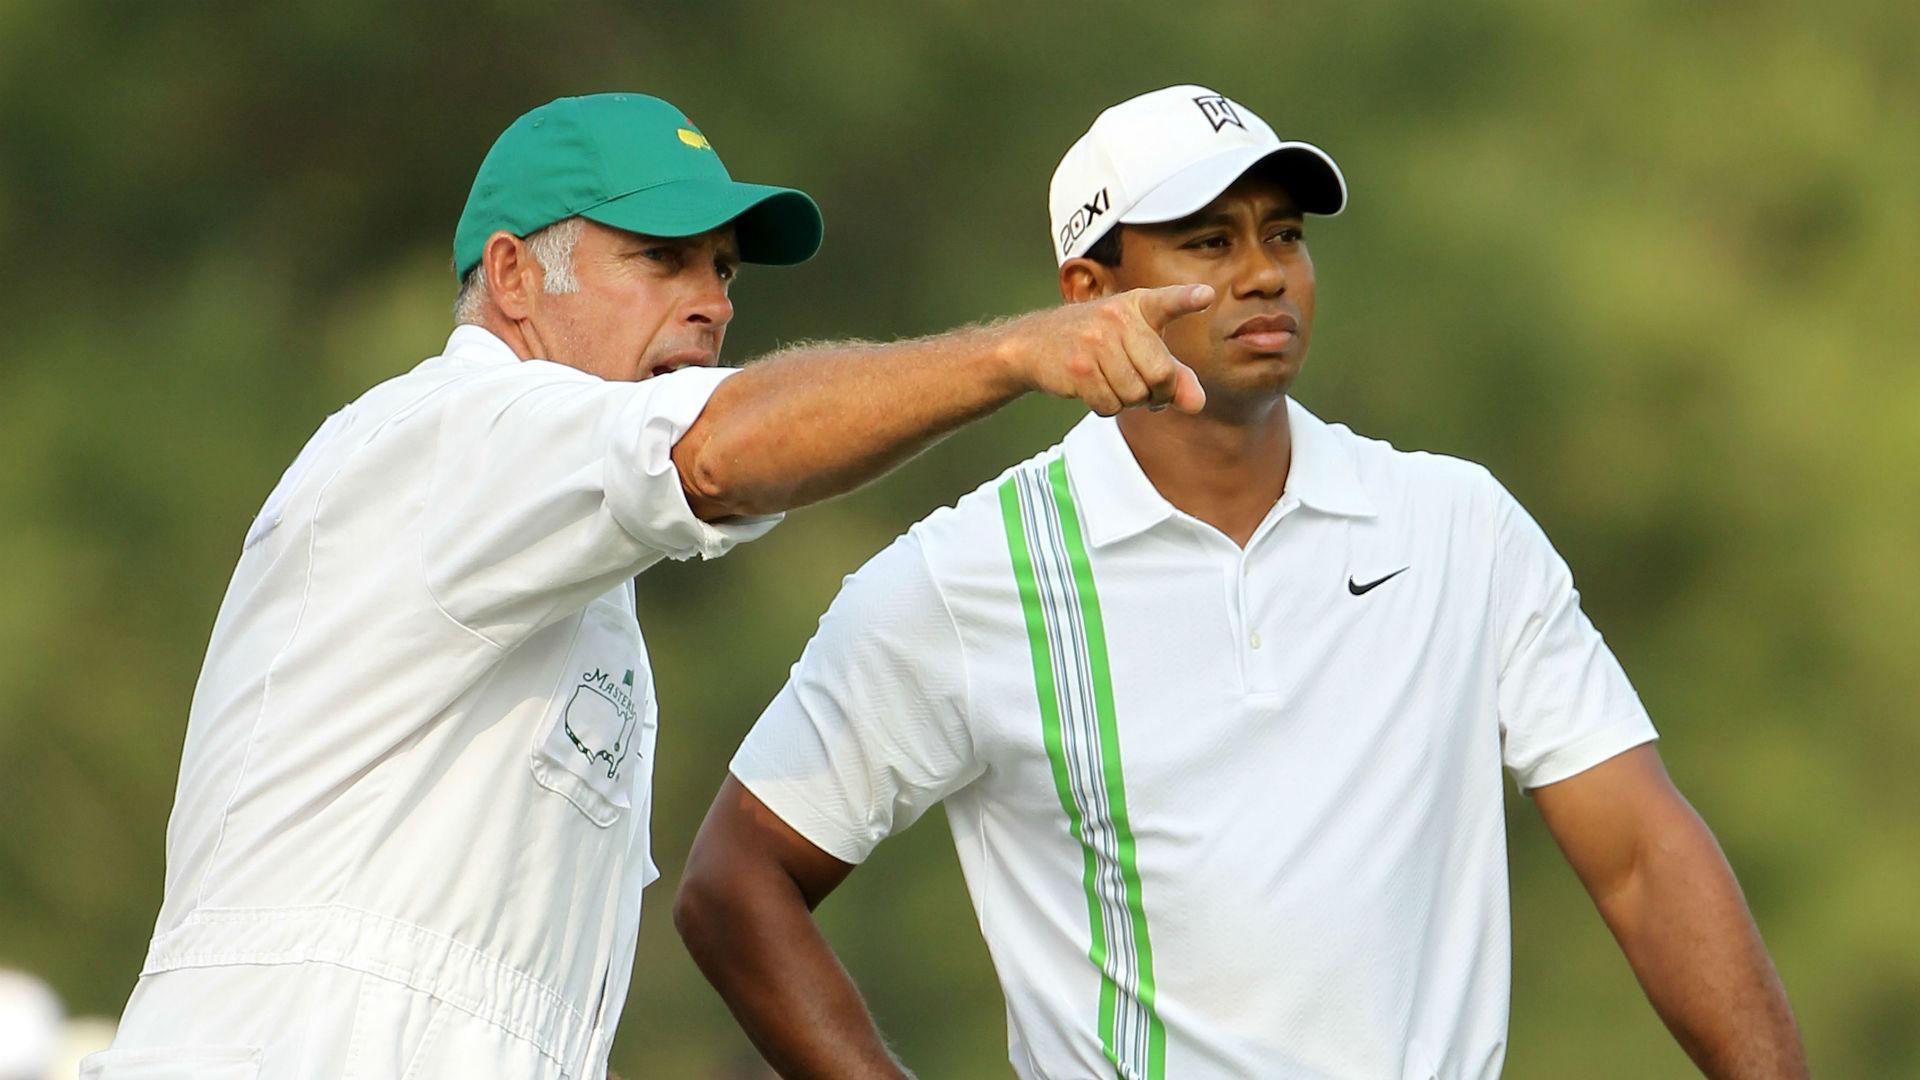 Tiger Woods' former caddie Steve Williams to make 2018 his last season